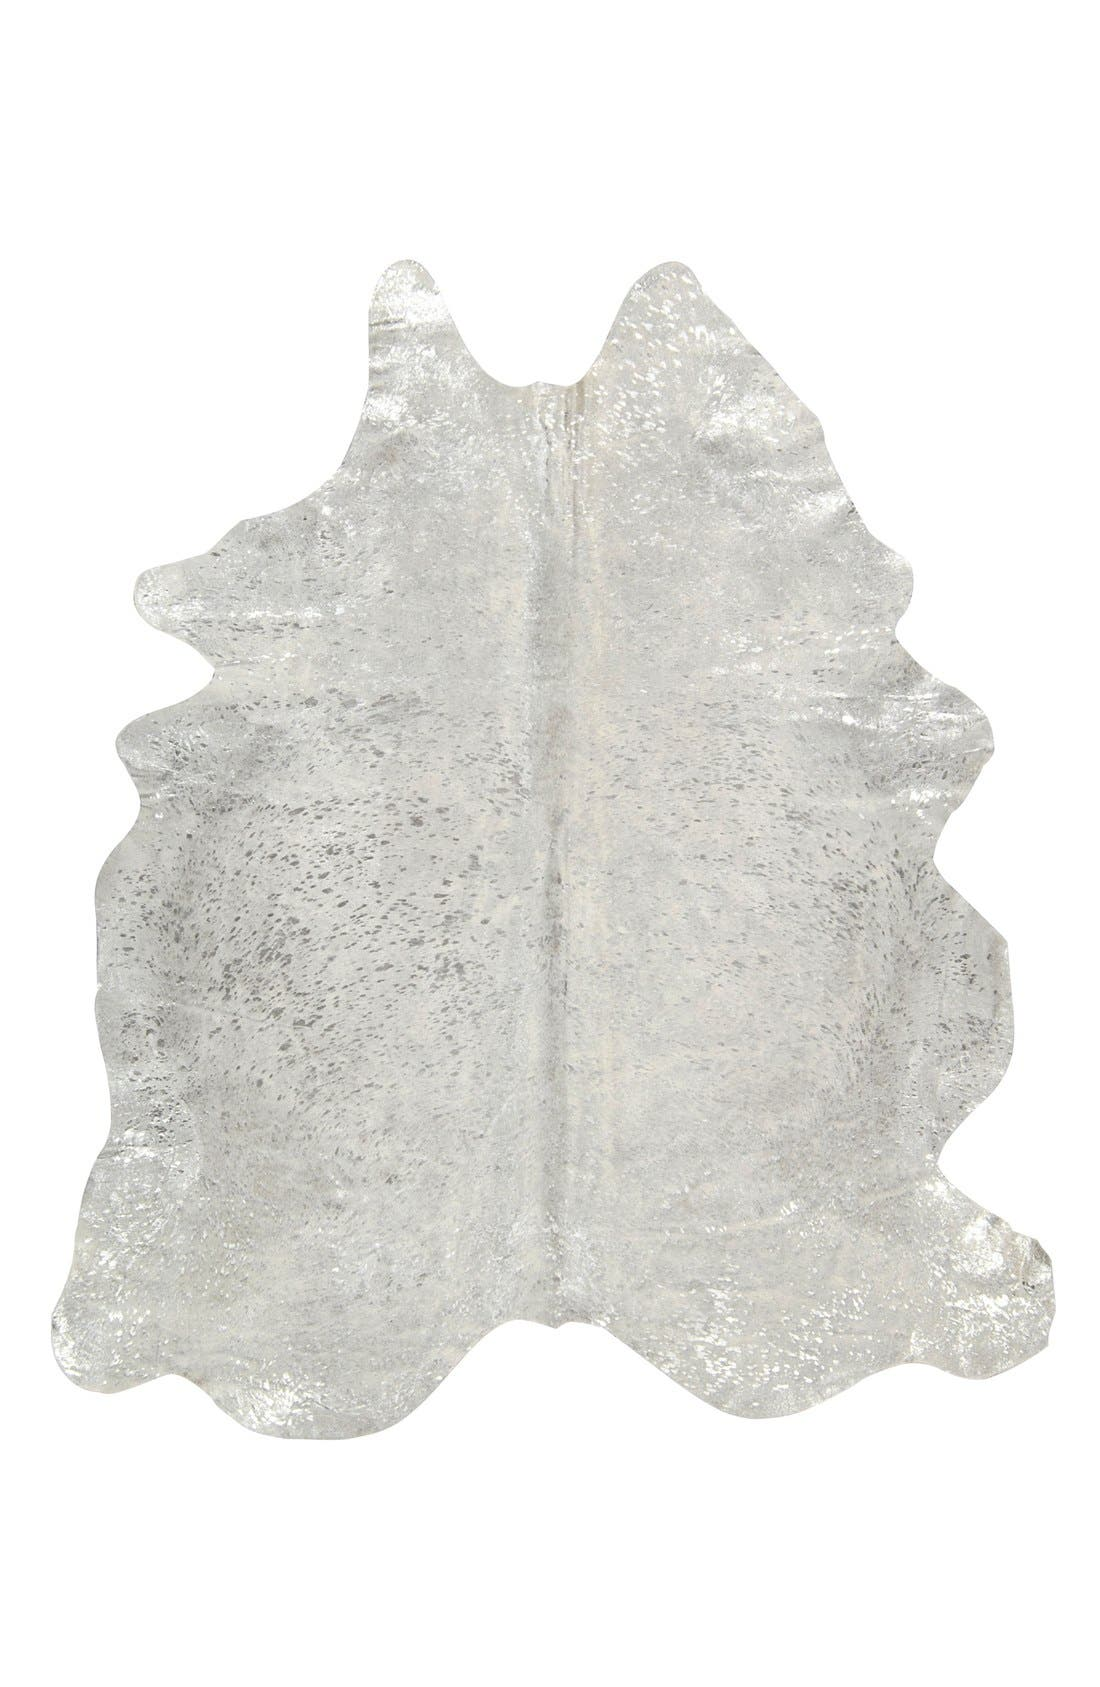 Mina Victory 'Metallic Splash' Genuine Cowhide Rug